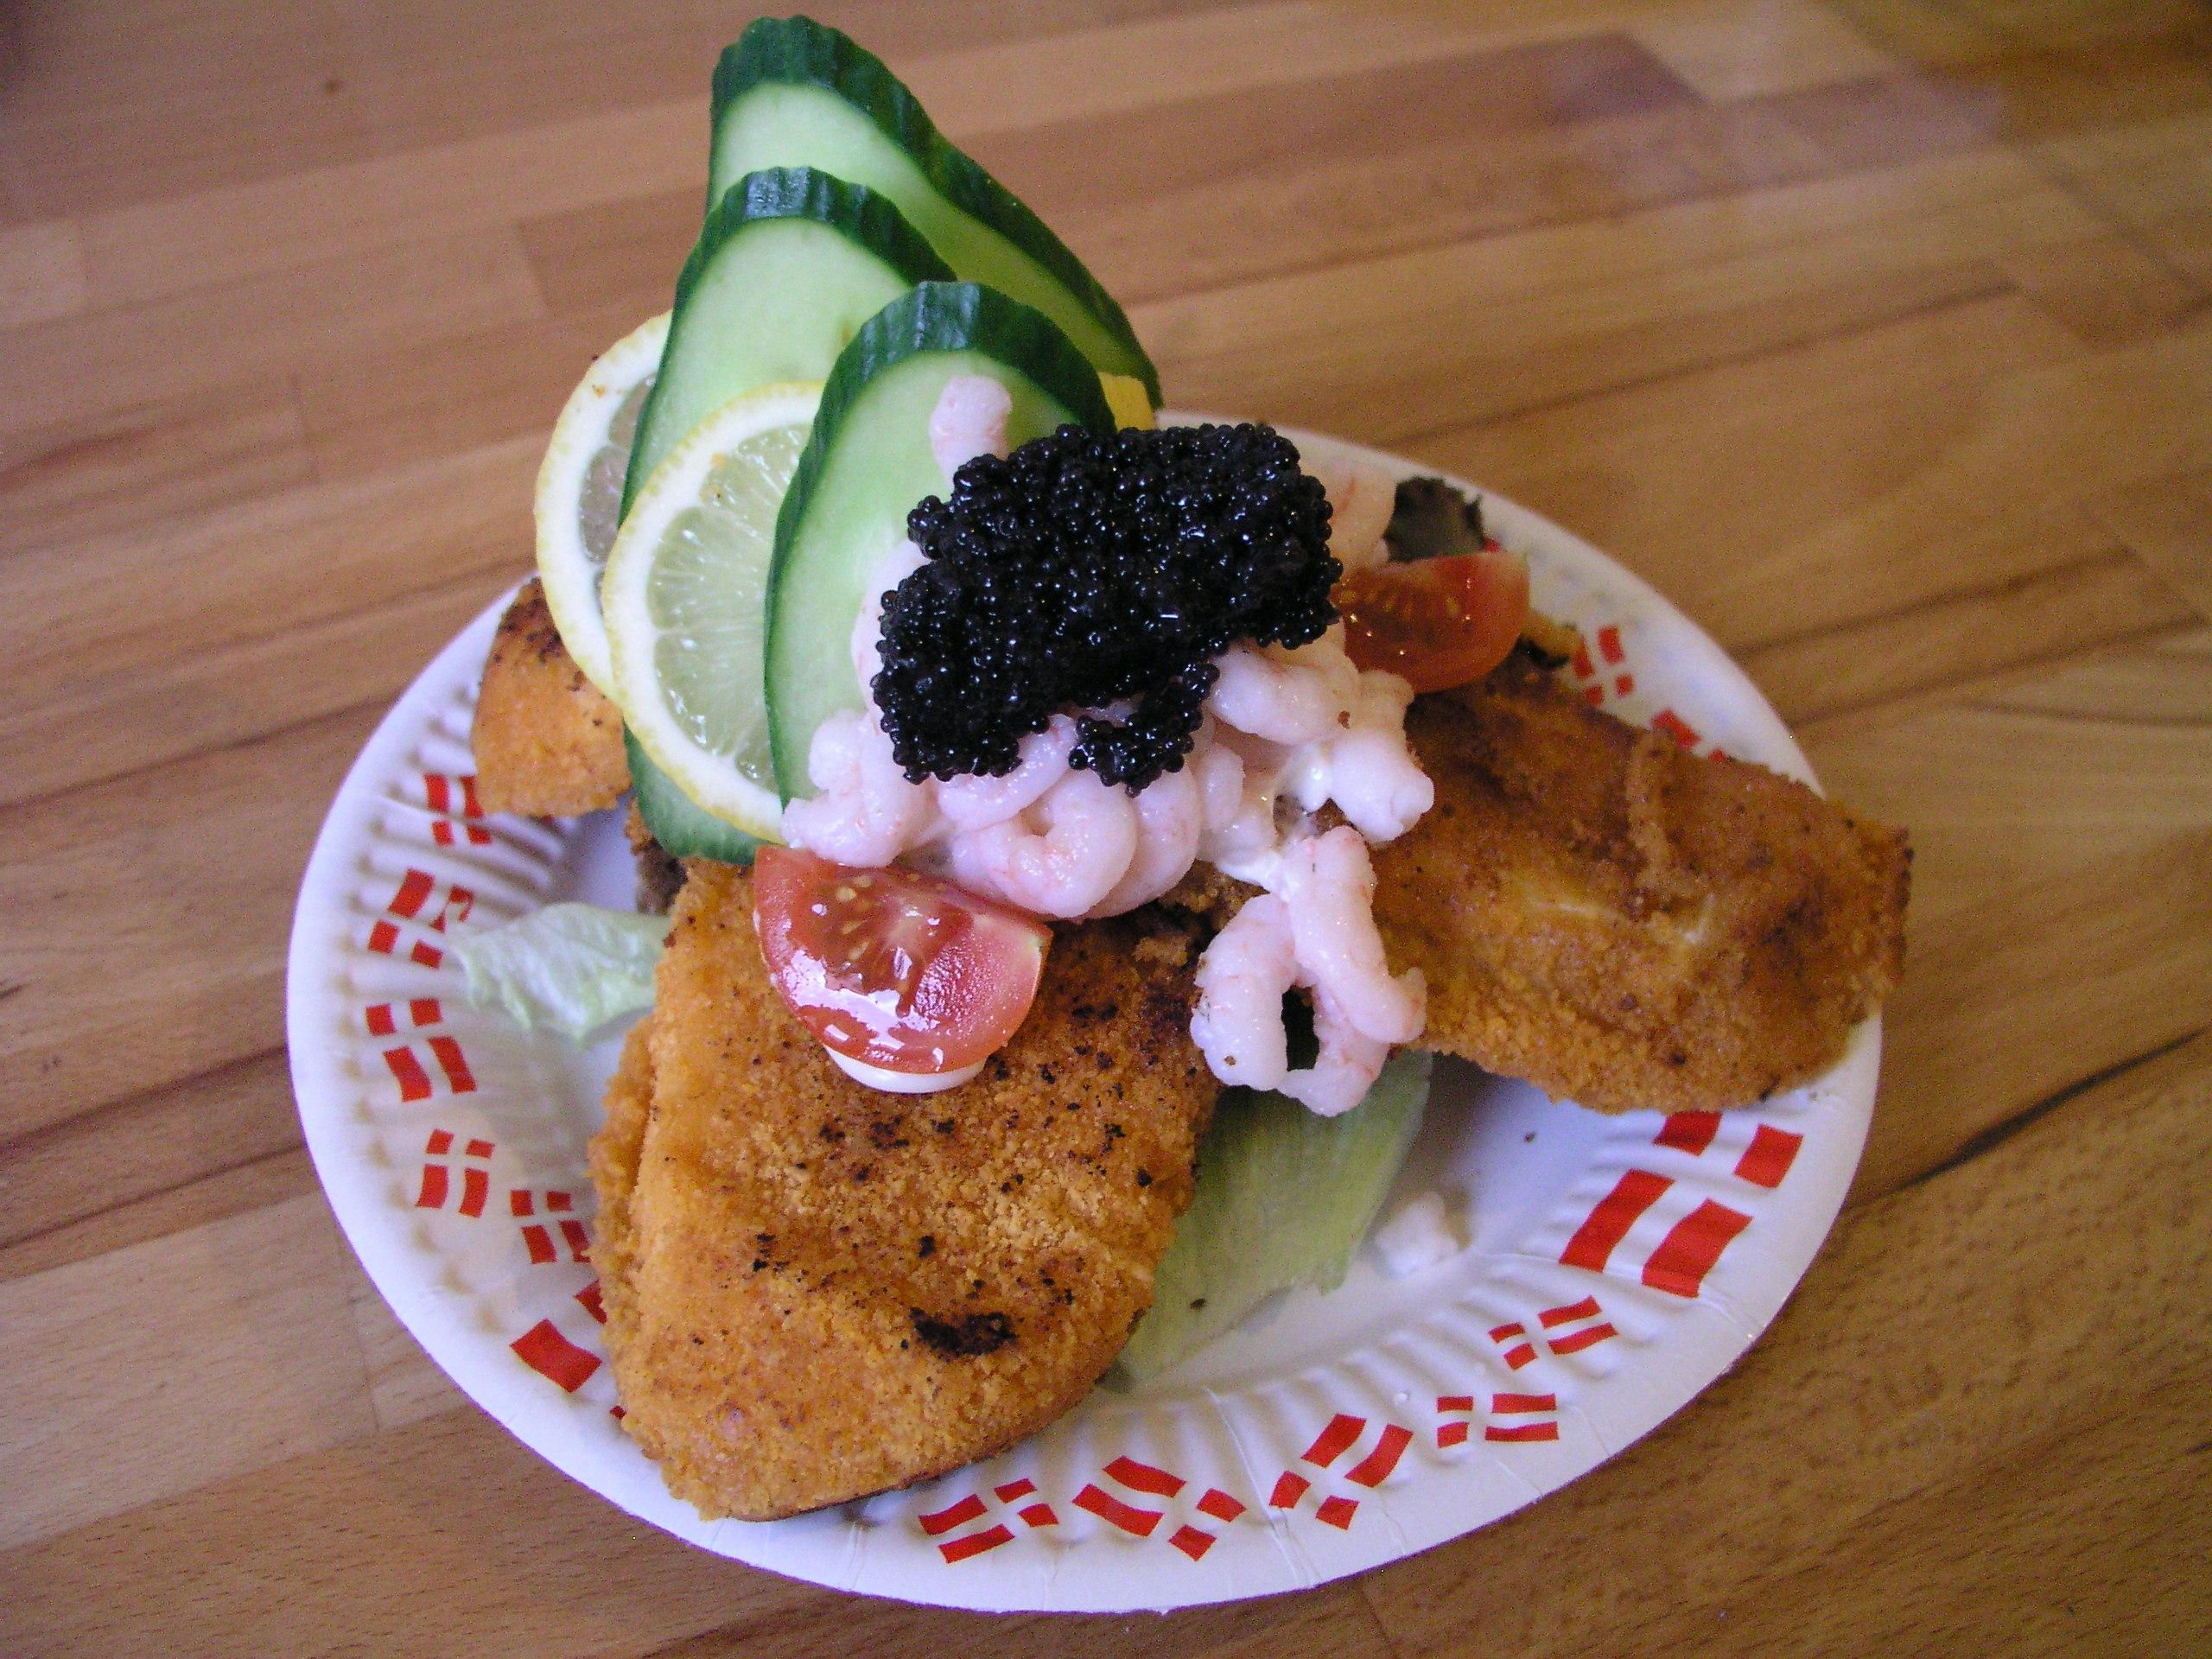 Dish showing a delicious Danish sandwich